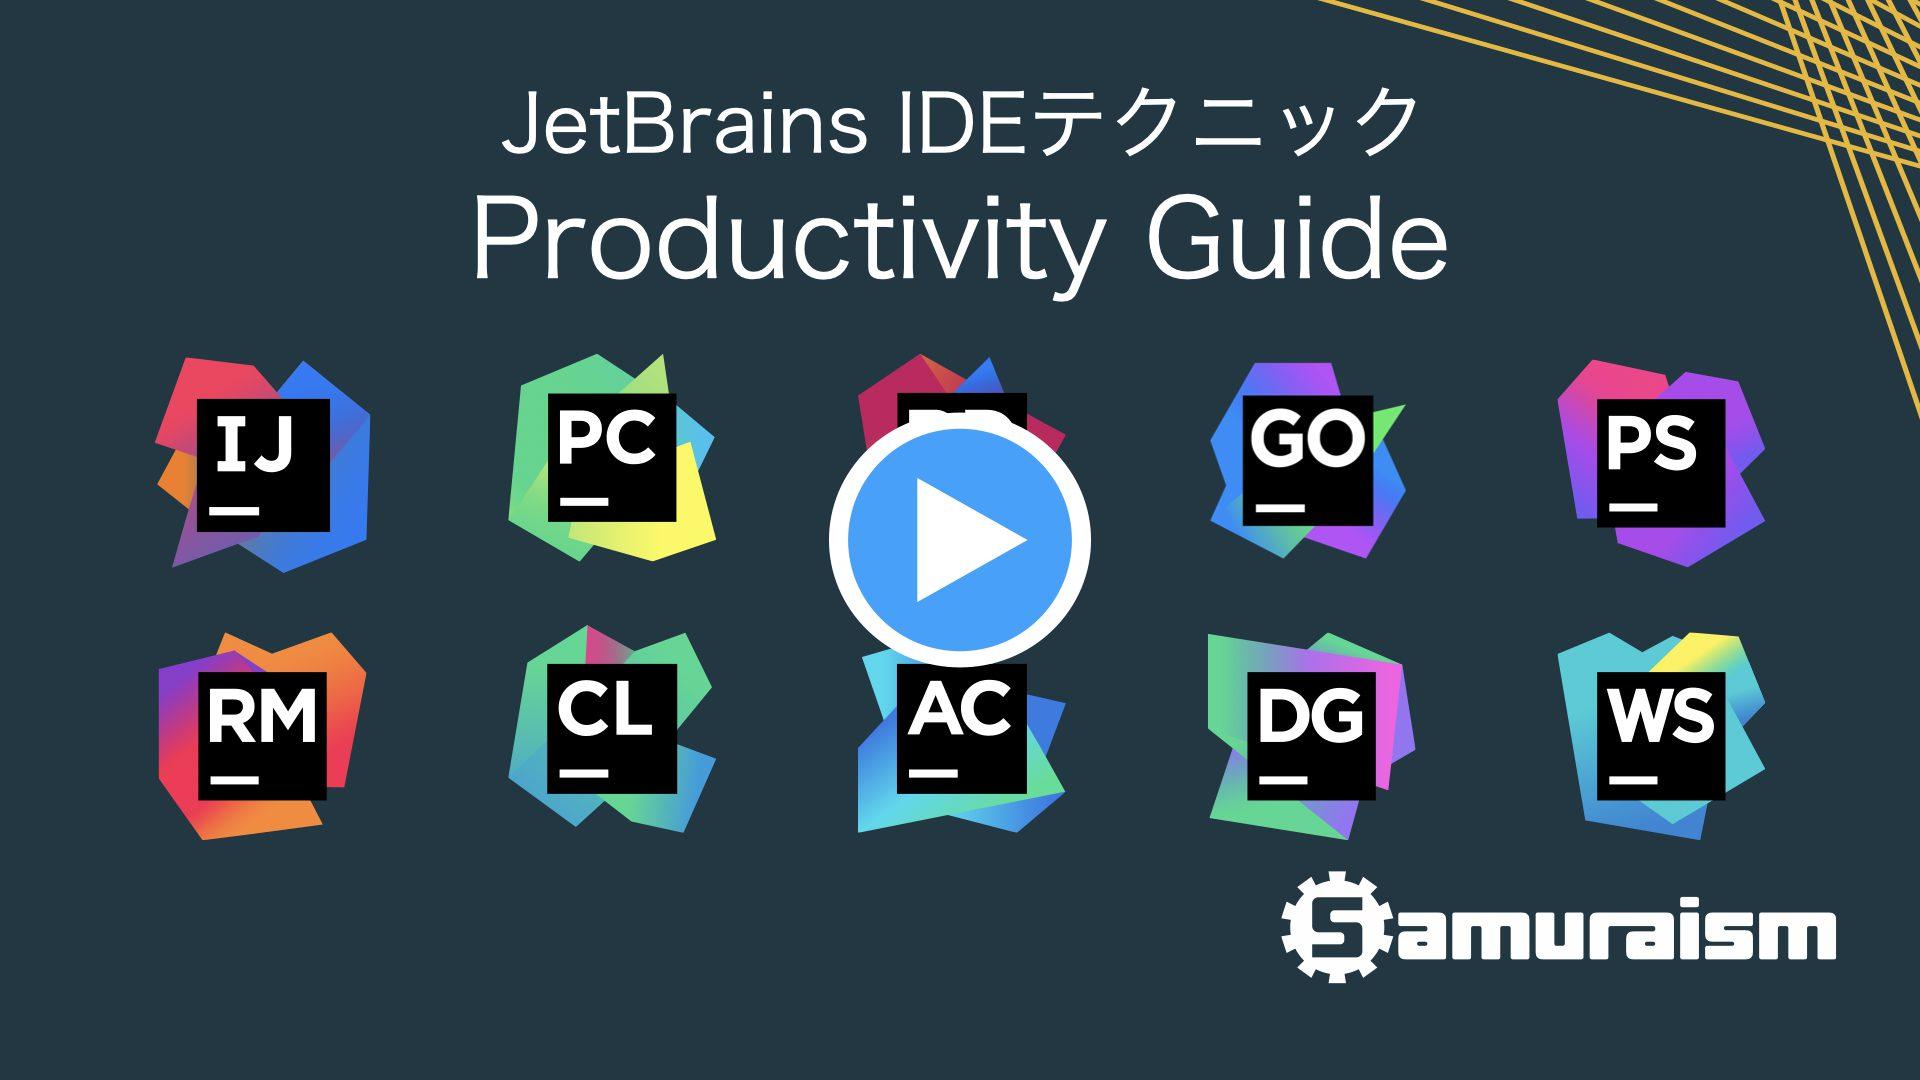 #JetBrainsIDEテクニック – Productivity Guide